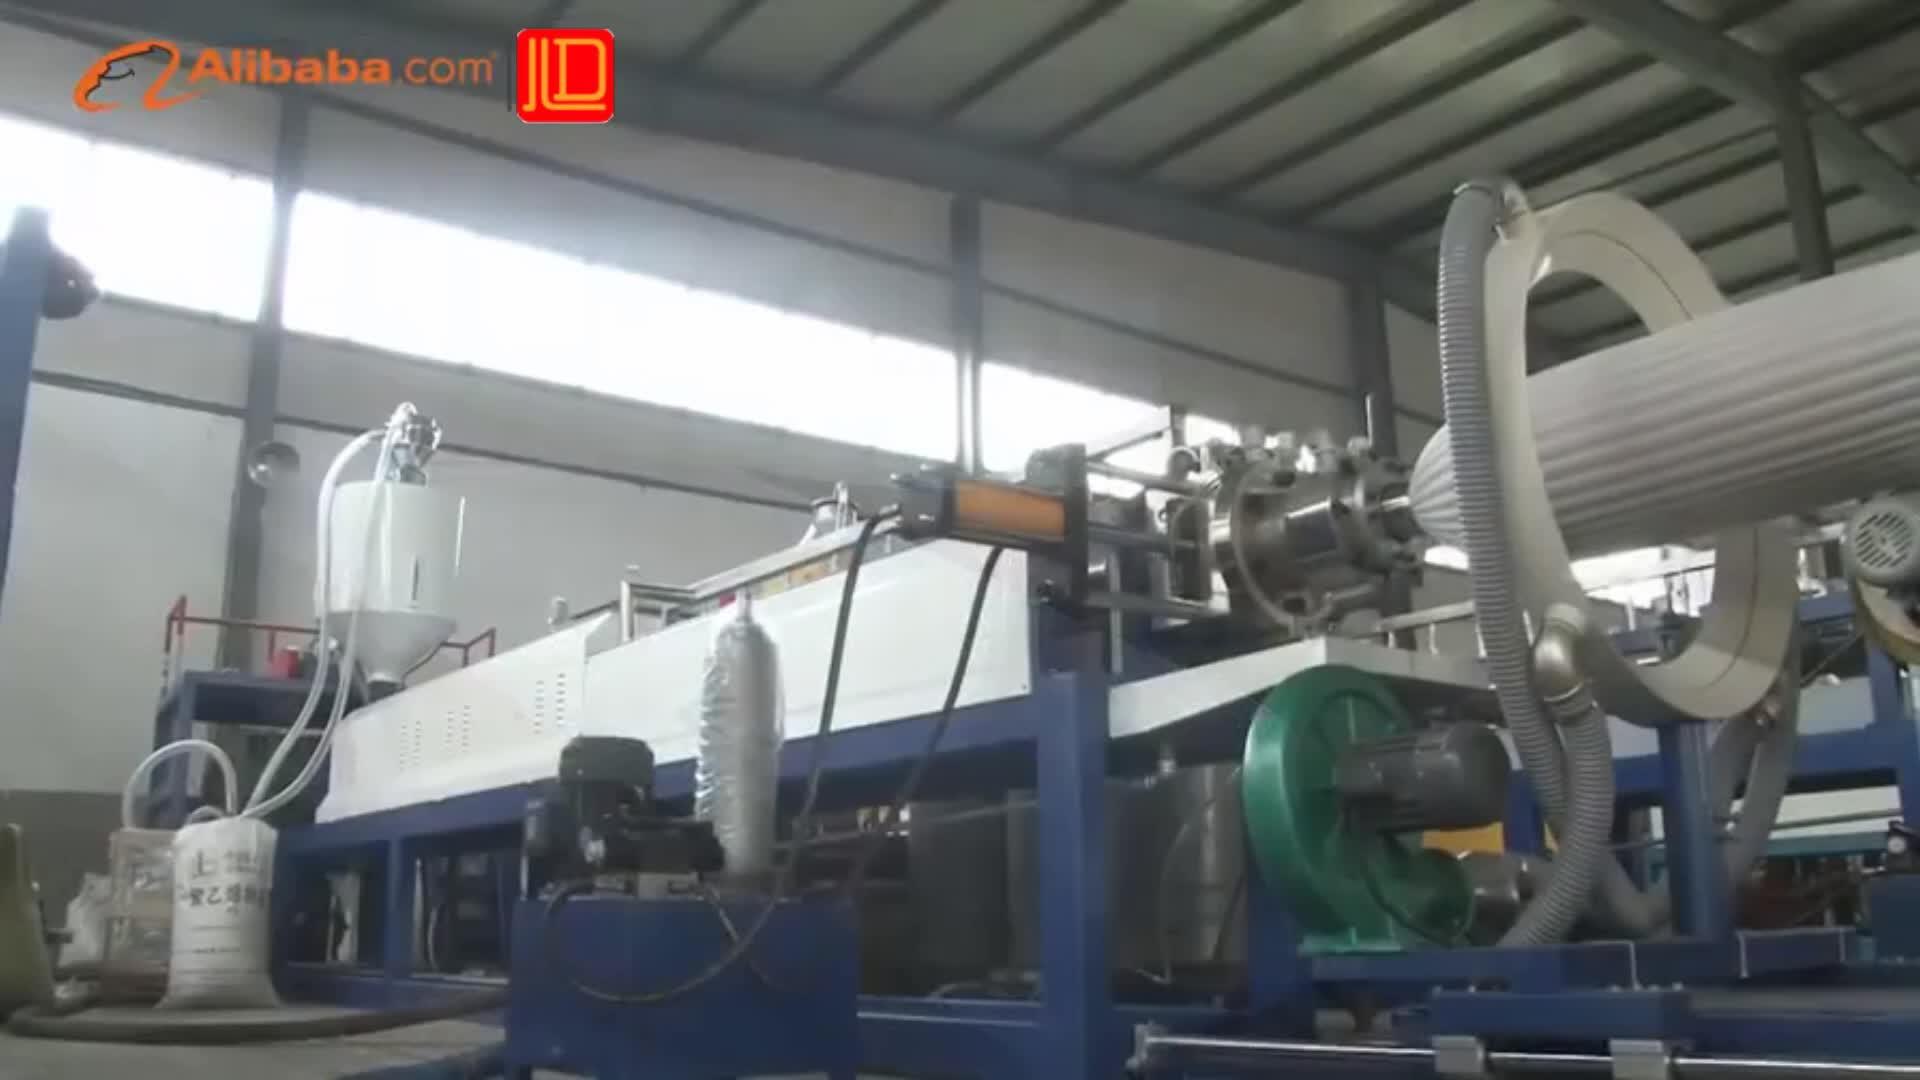 Extrudiermaschine aus expandiertem PE-Kunststoffschaumstoff